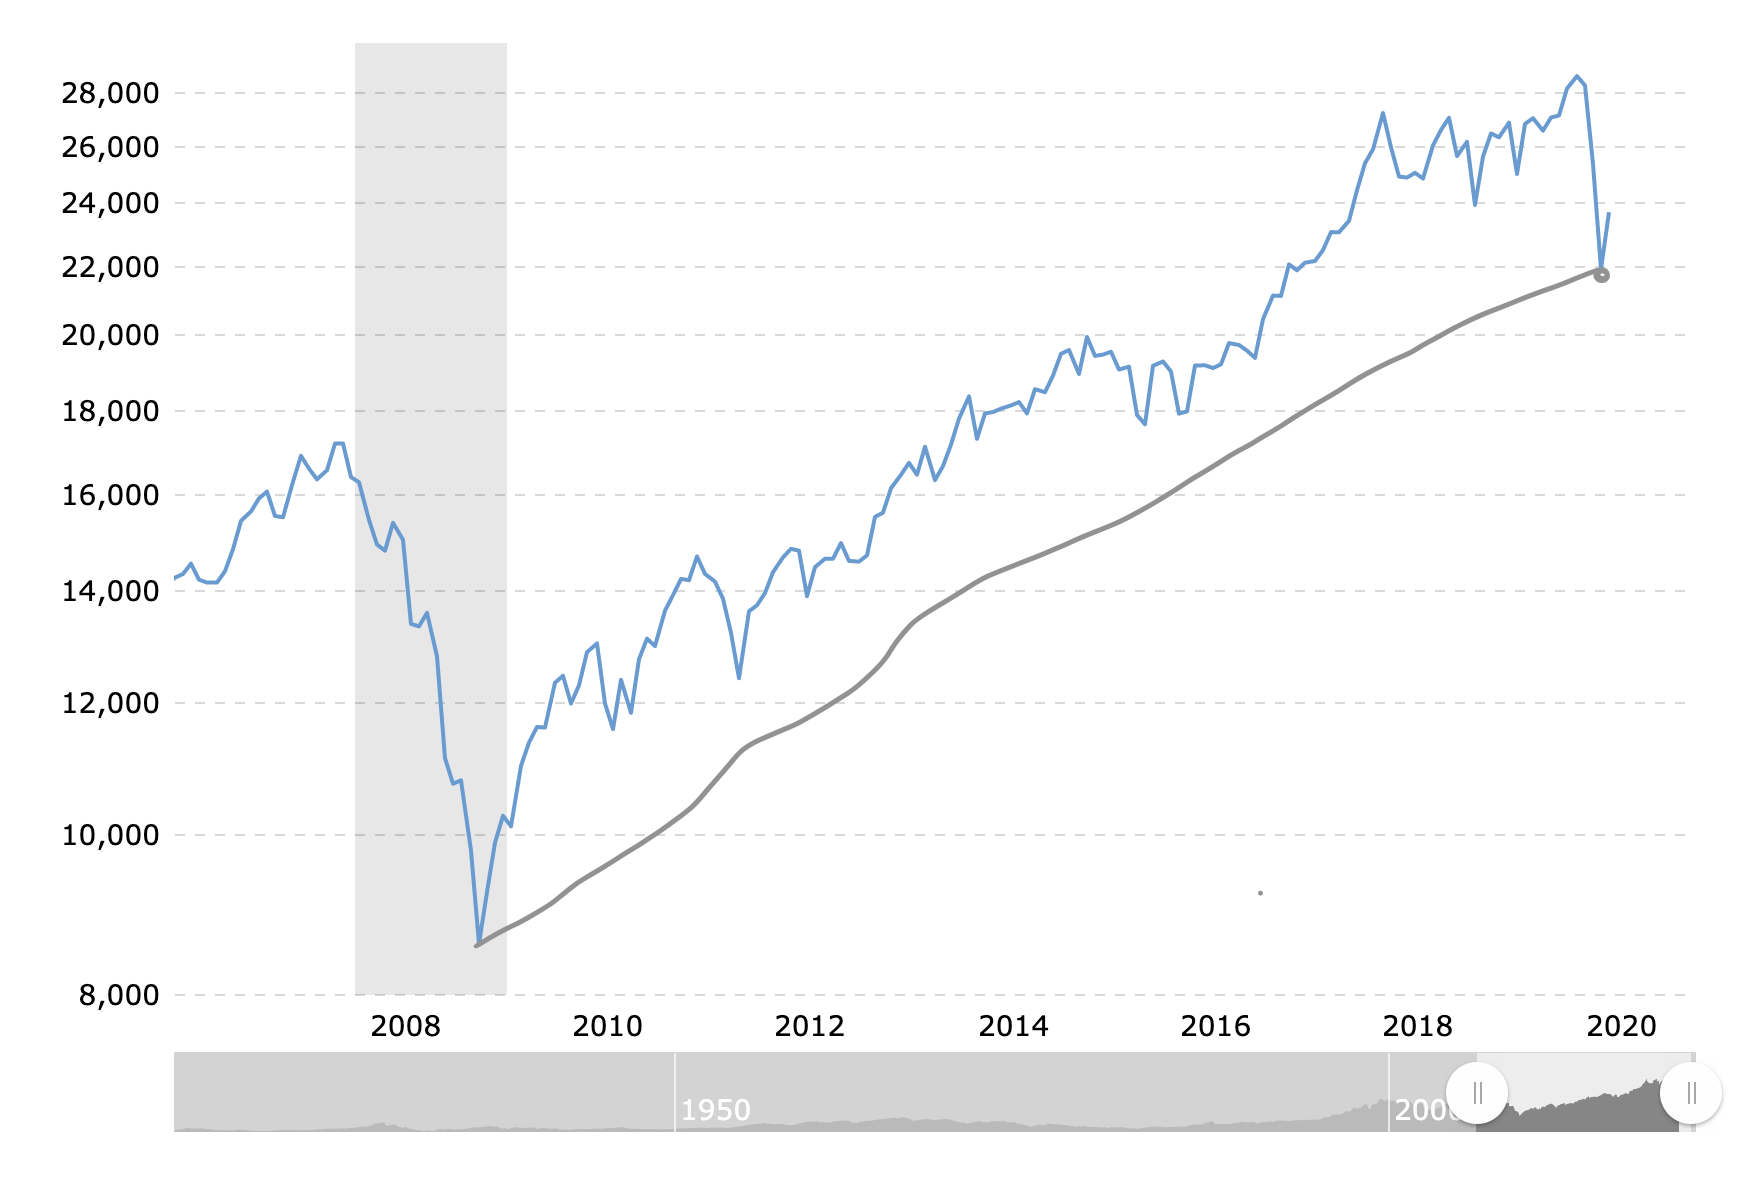 2018 Recession Vs 2020 Recession